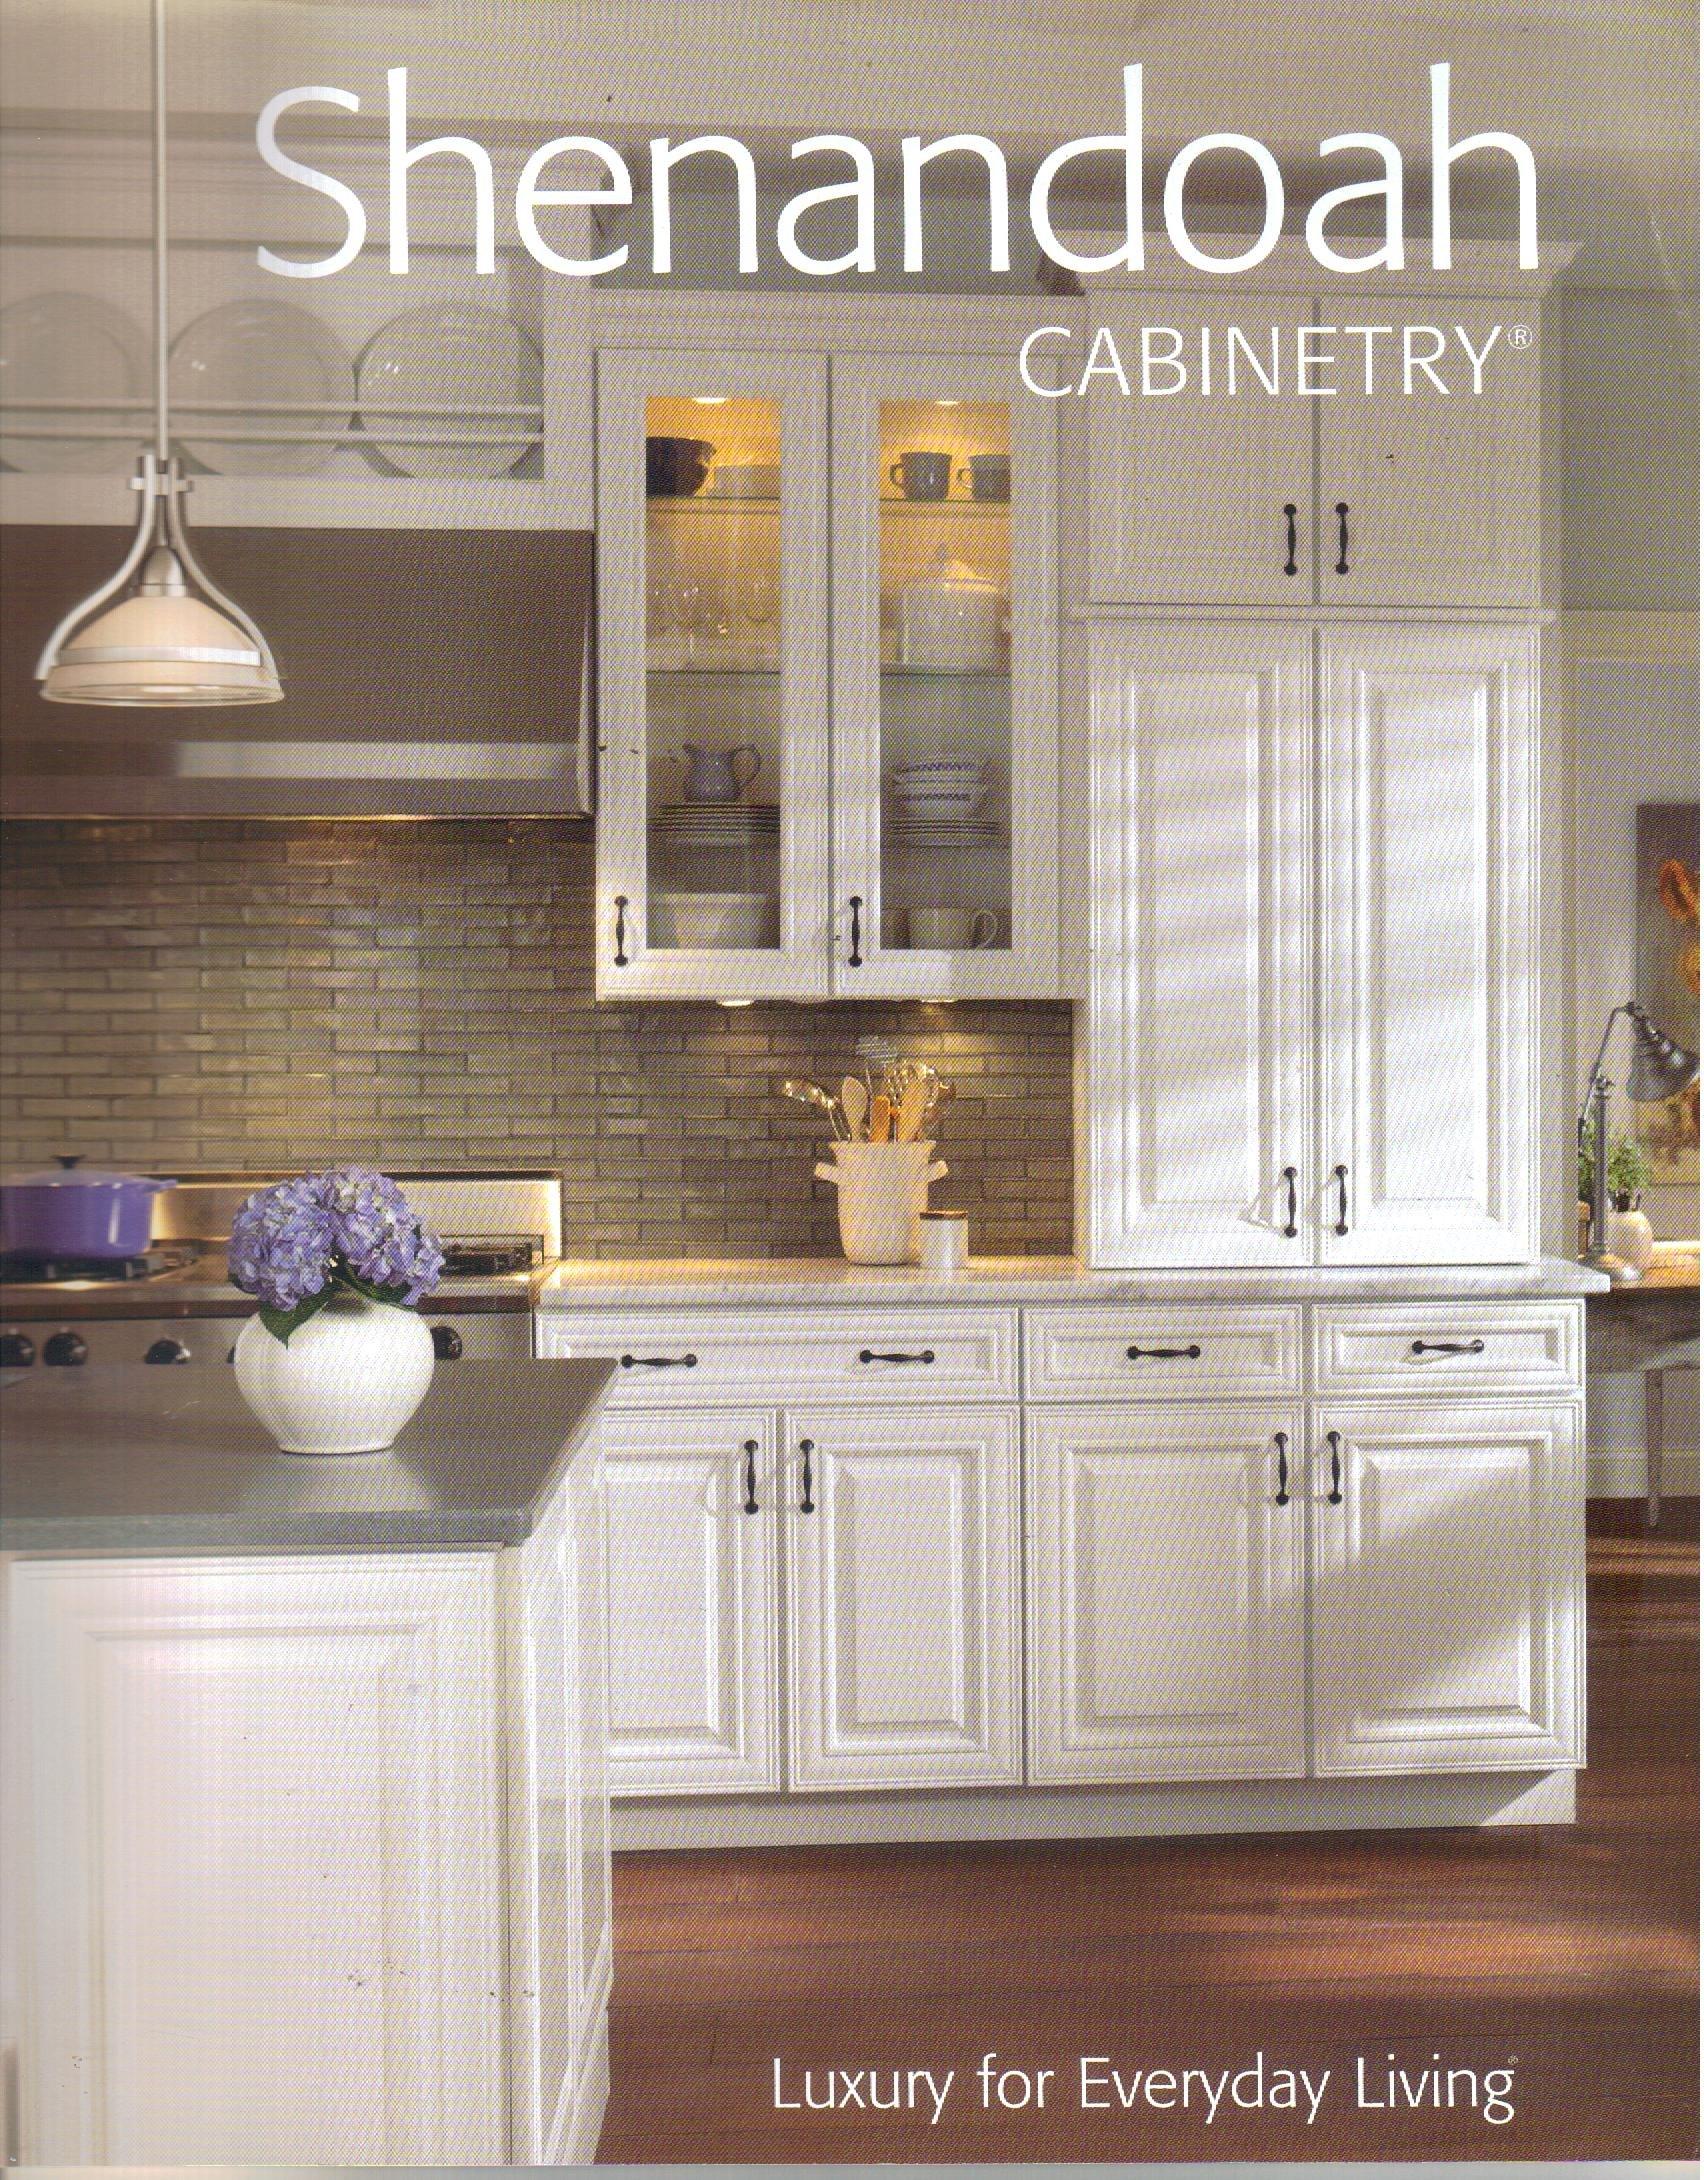 shenandoah cabinetry